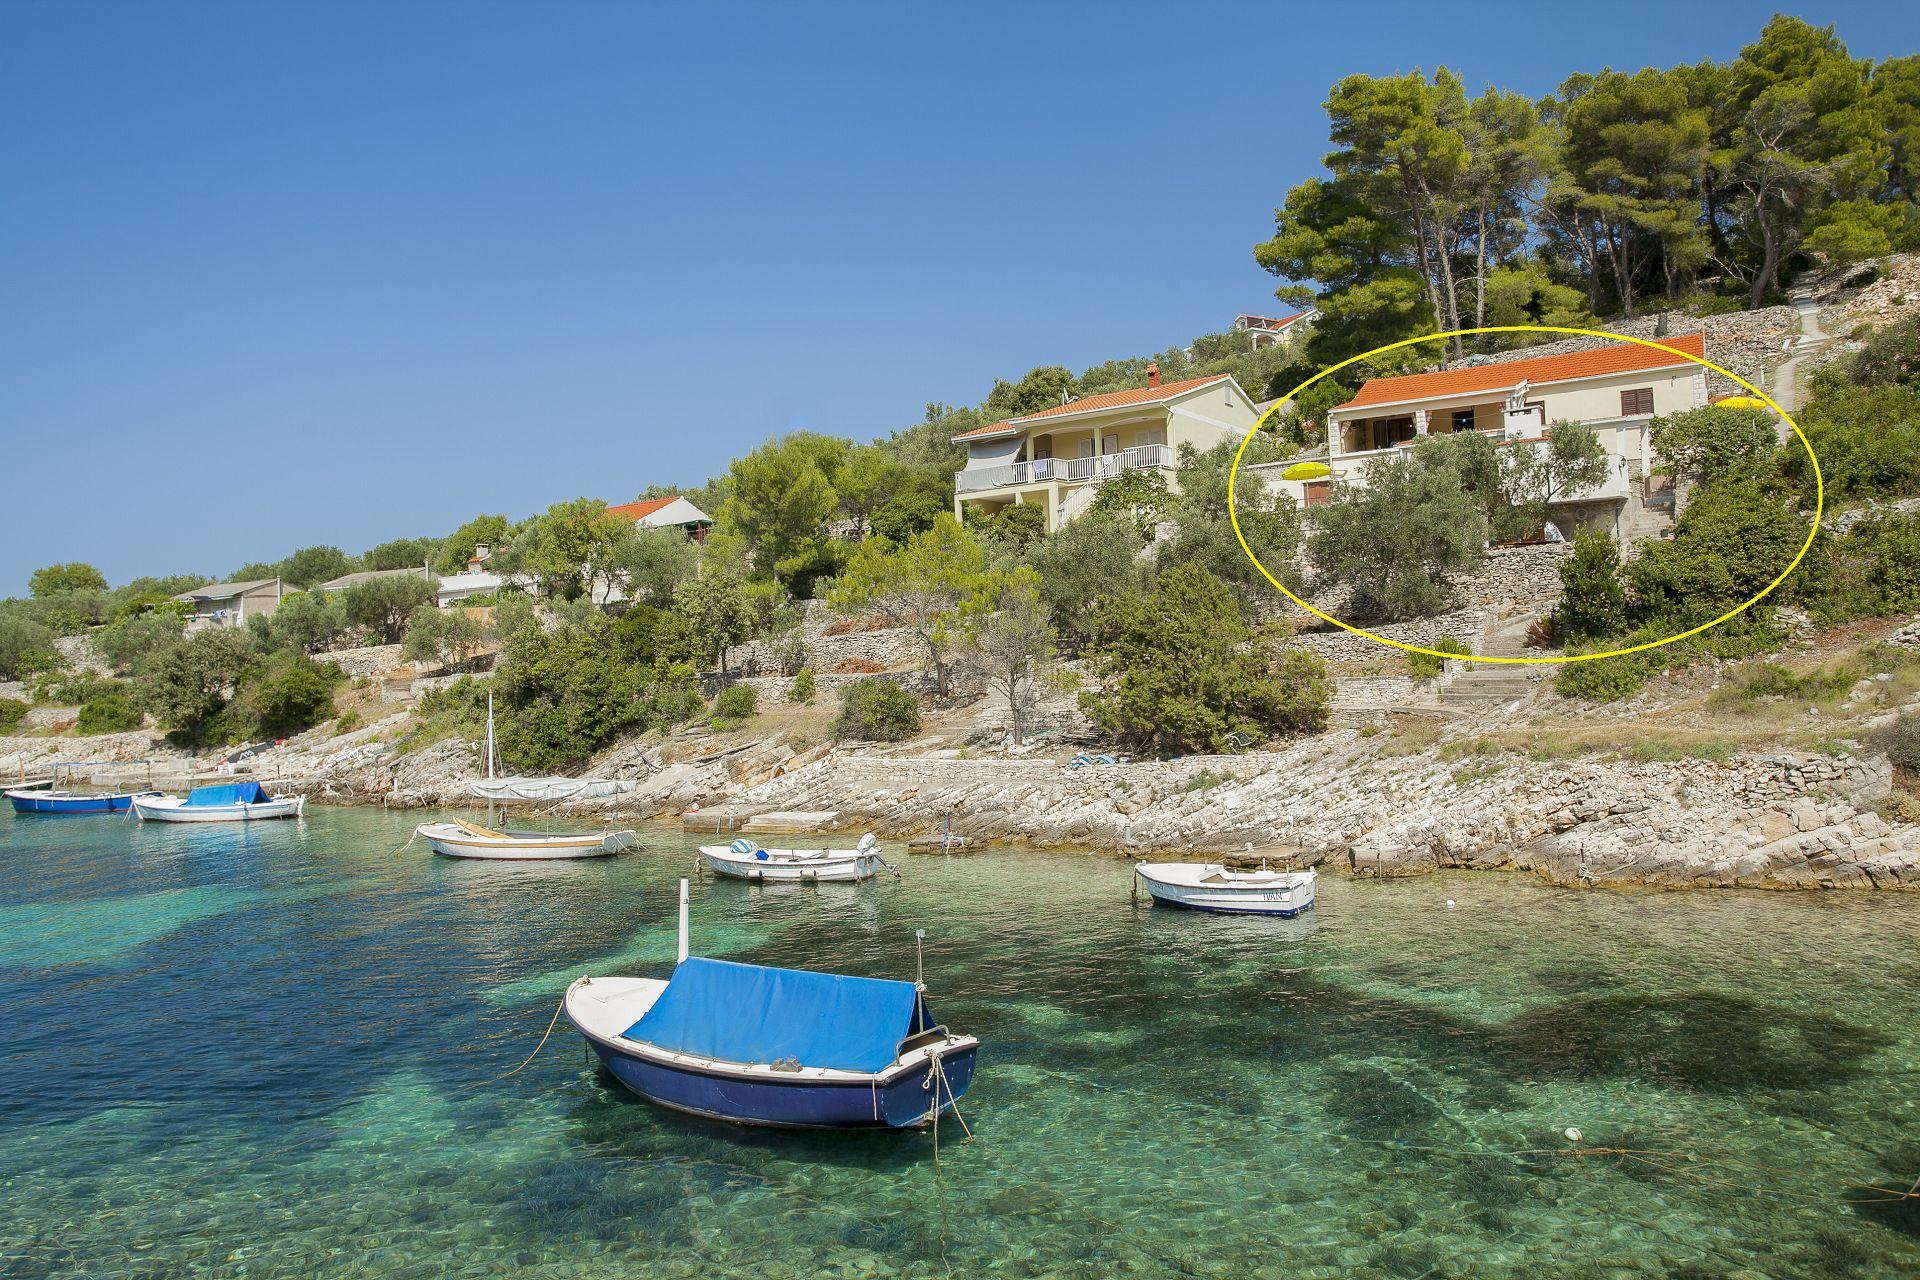 Villa Bistrana - Cove Tankaraca (Vela Luka) - Holiday houses, villas Croatia